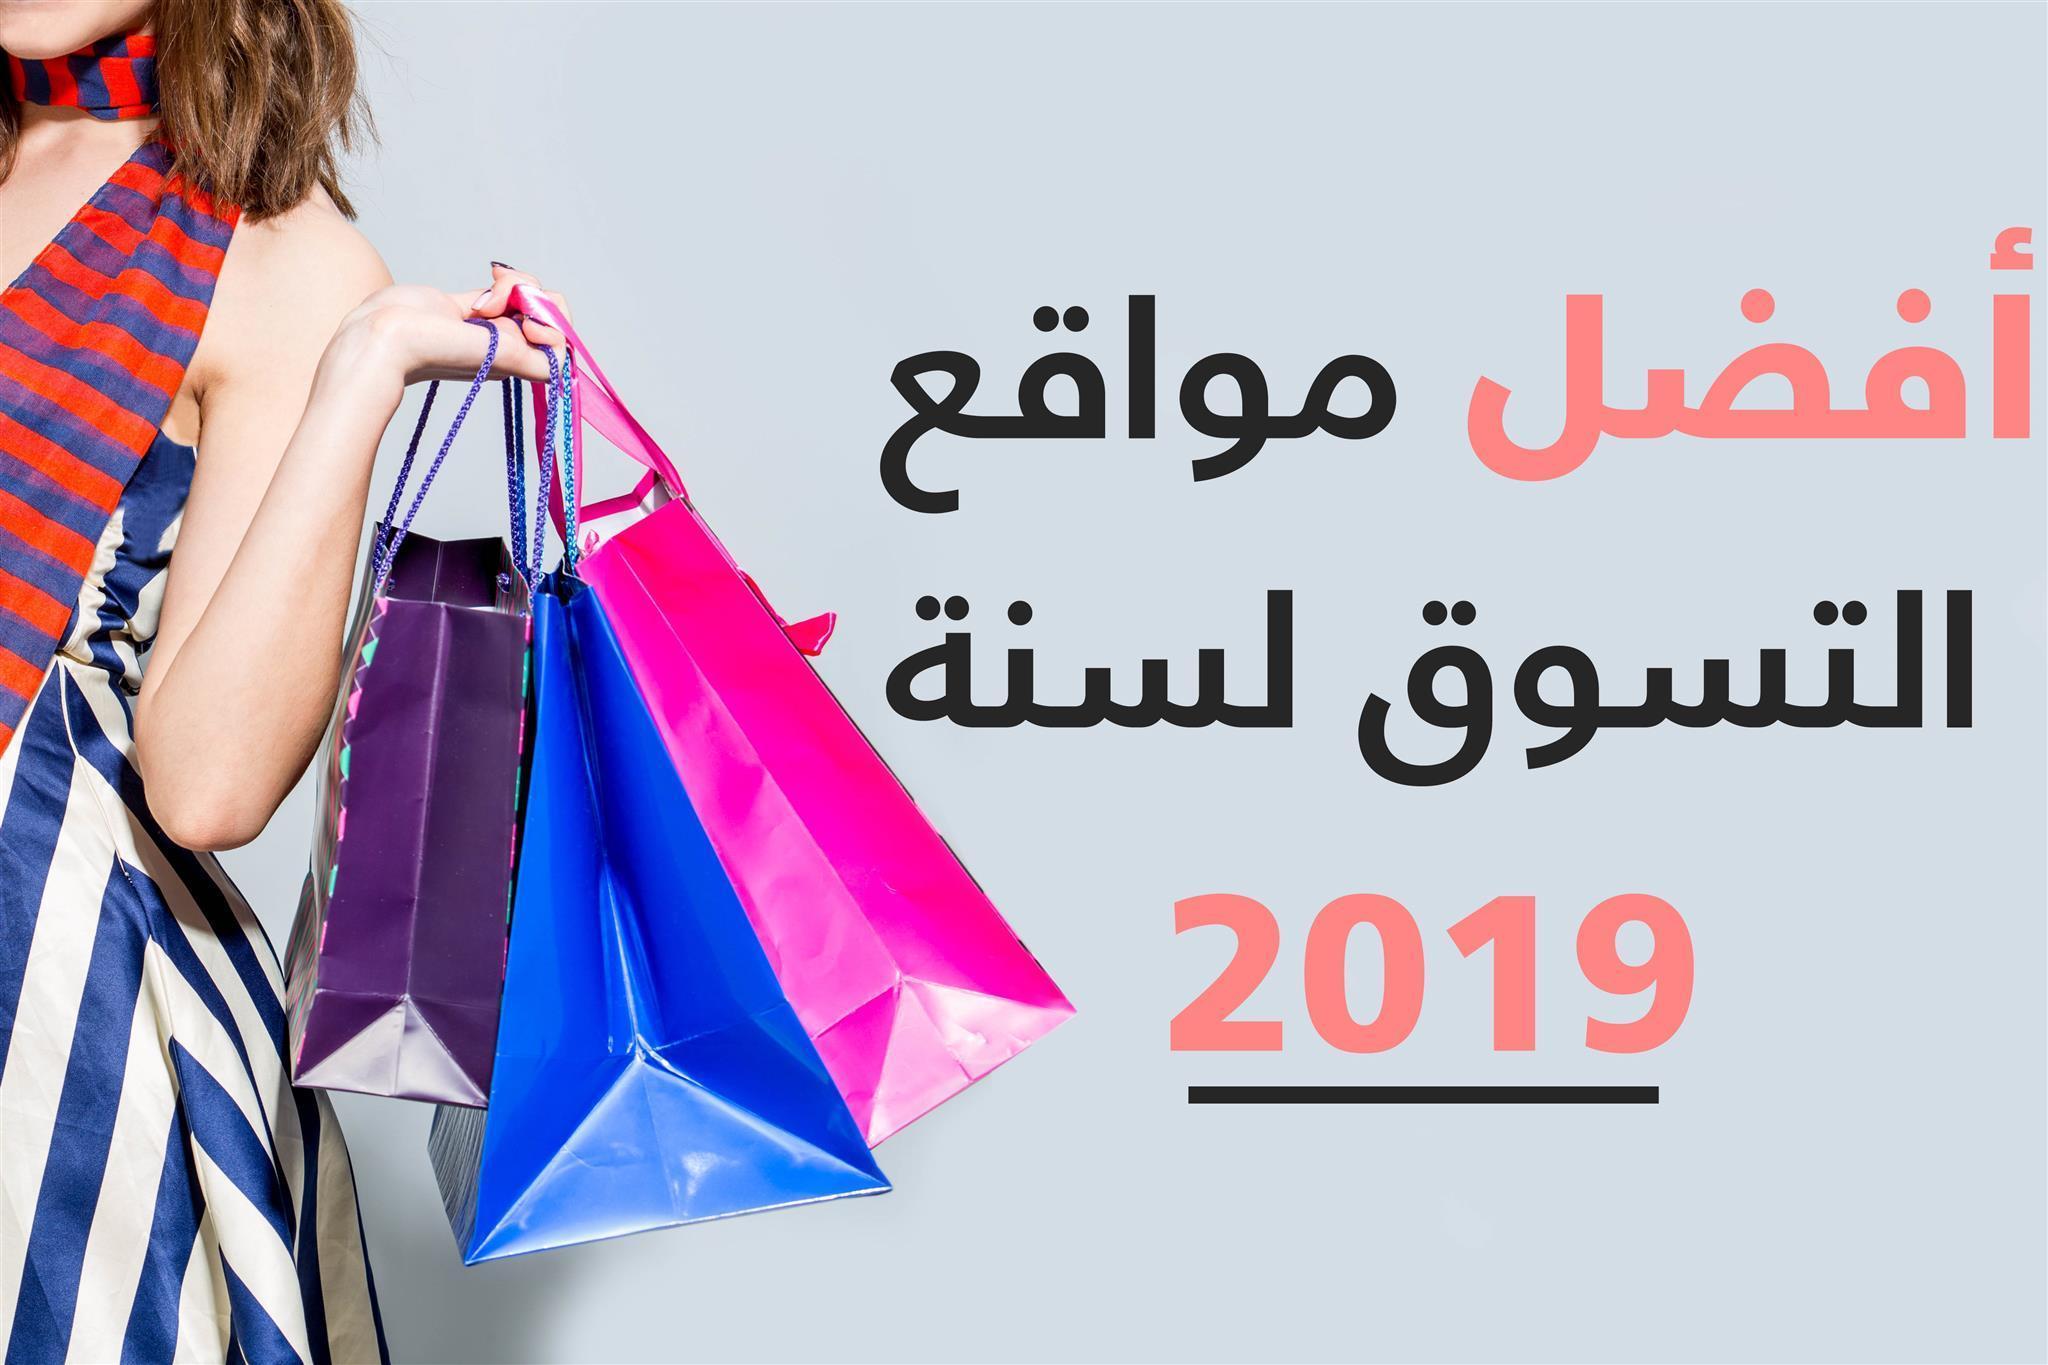 7ed9800f4 أشهر 10 مواقع تسوق رخيصة فى السعودية بتخفيضات مميزة حتي 75% الأن